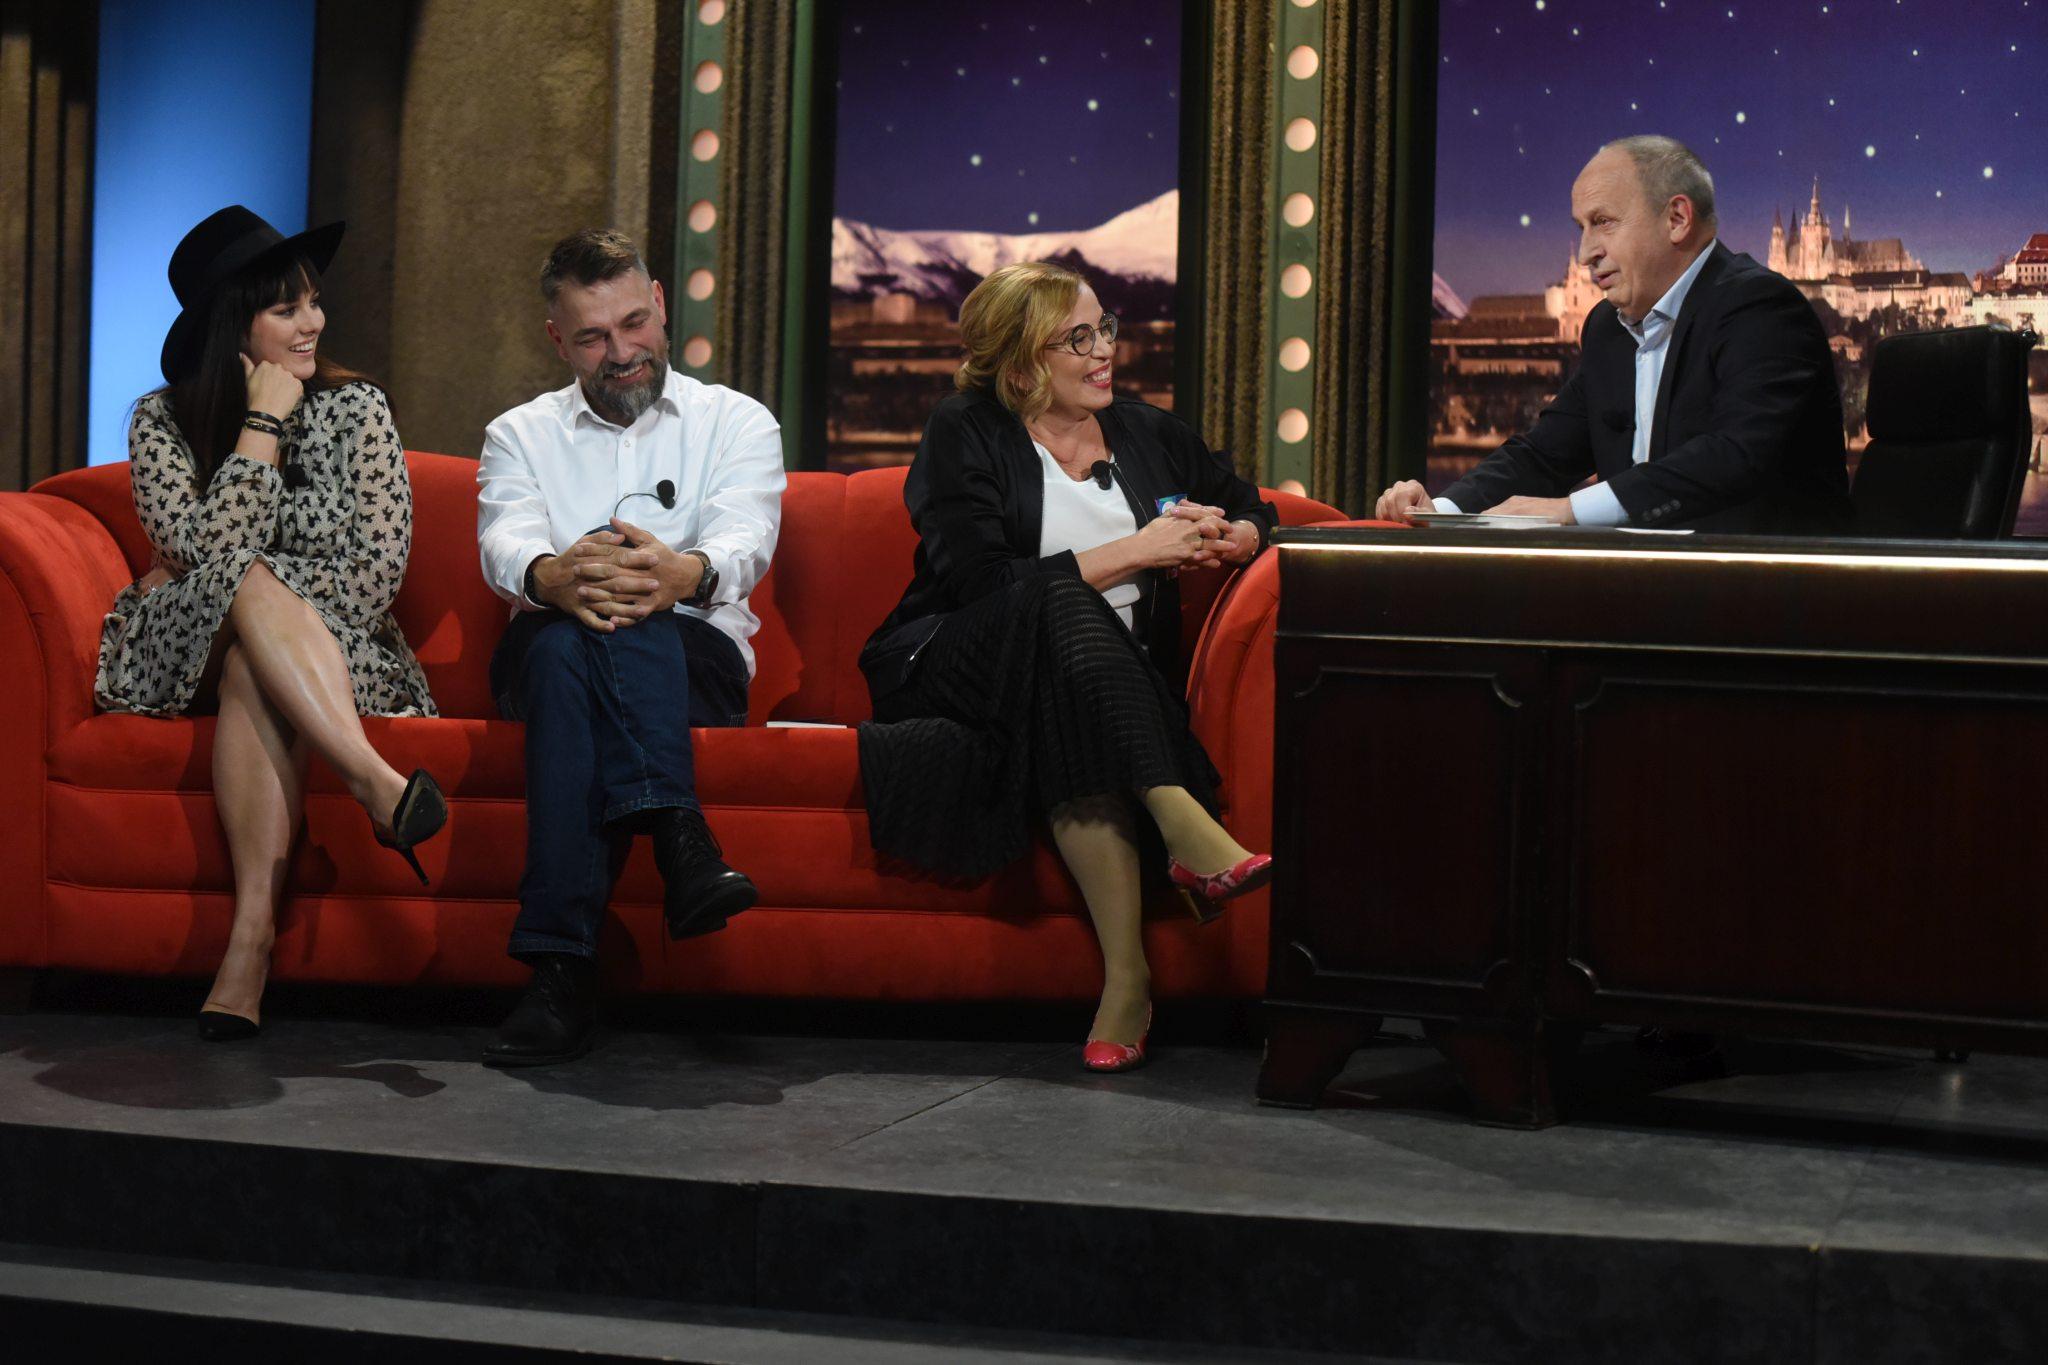 Zpěvačka Ewa Farna, hradní pán a pivovarník Ondřej Slačálek a koučka Janka Chudlíková v SJK 11. 9. 2019